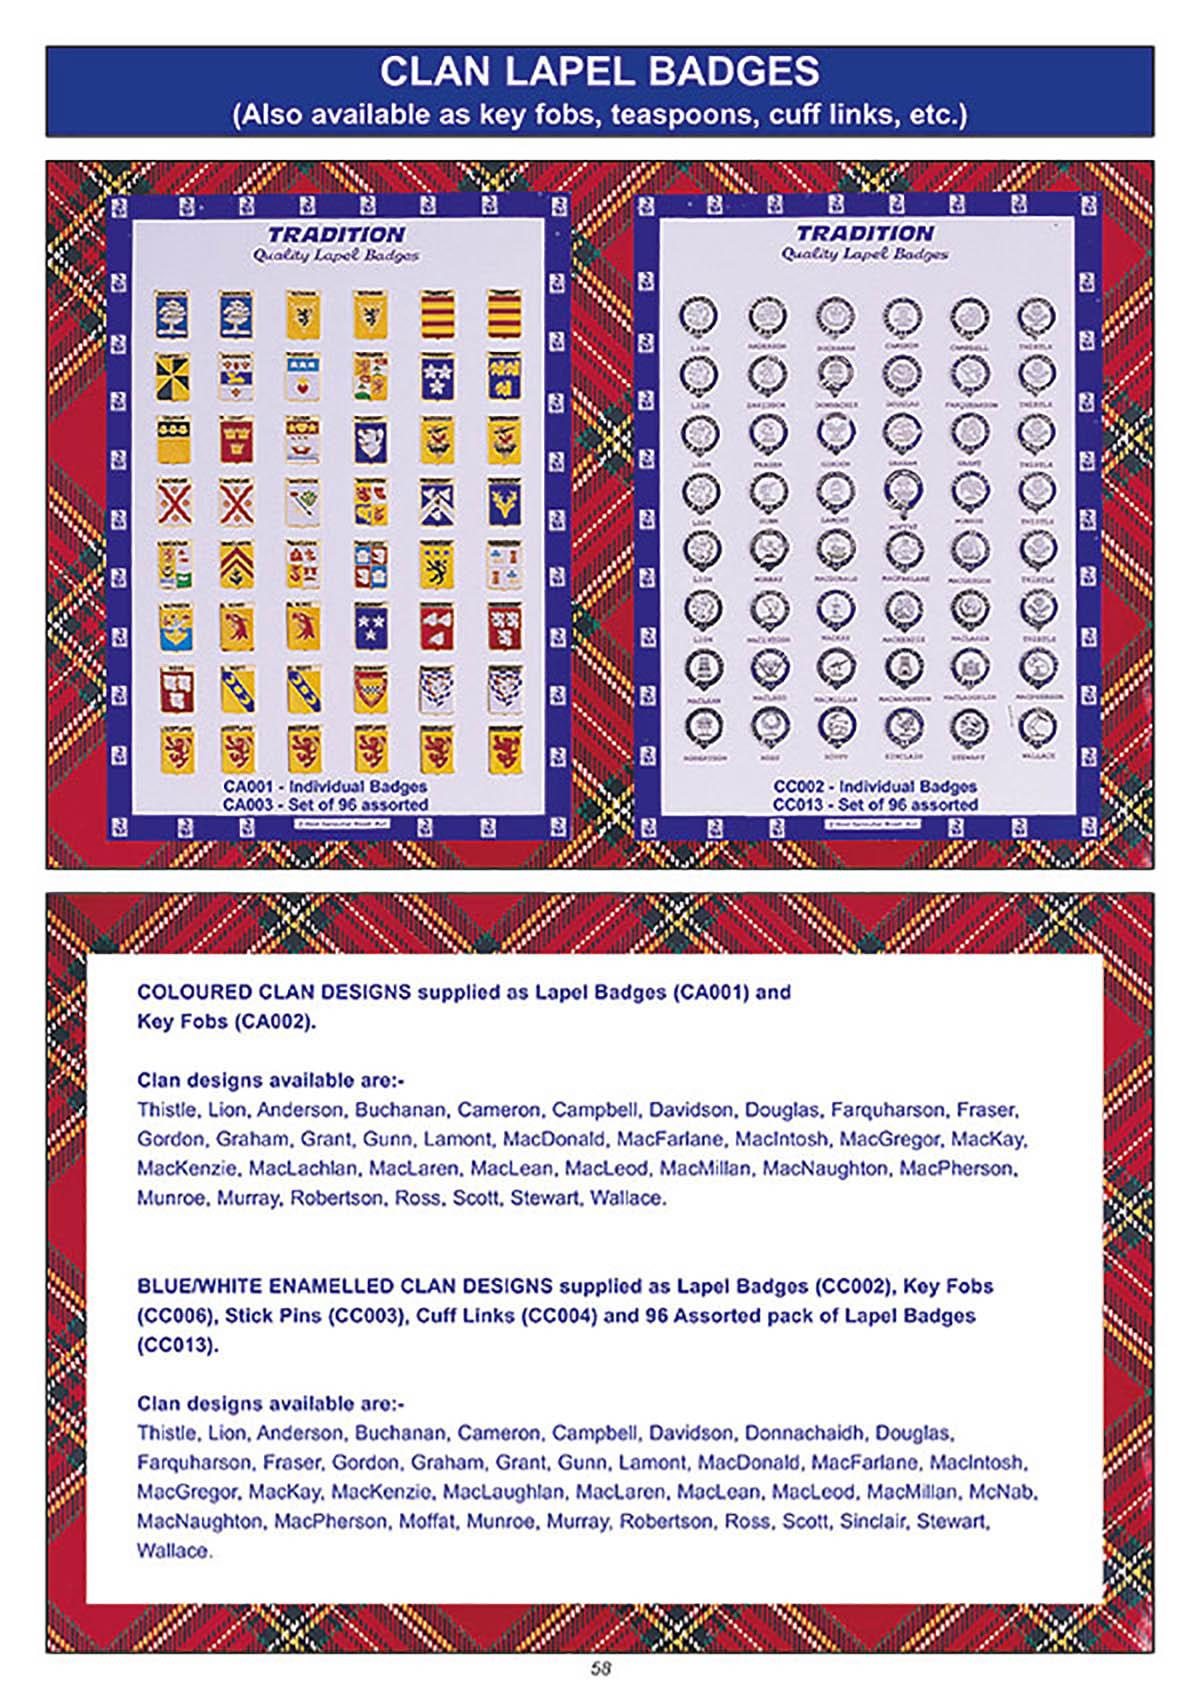 souvenir clan lapel badges giftware